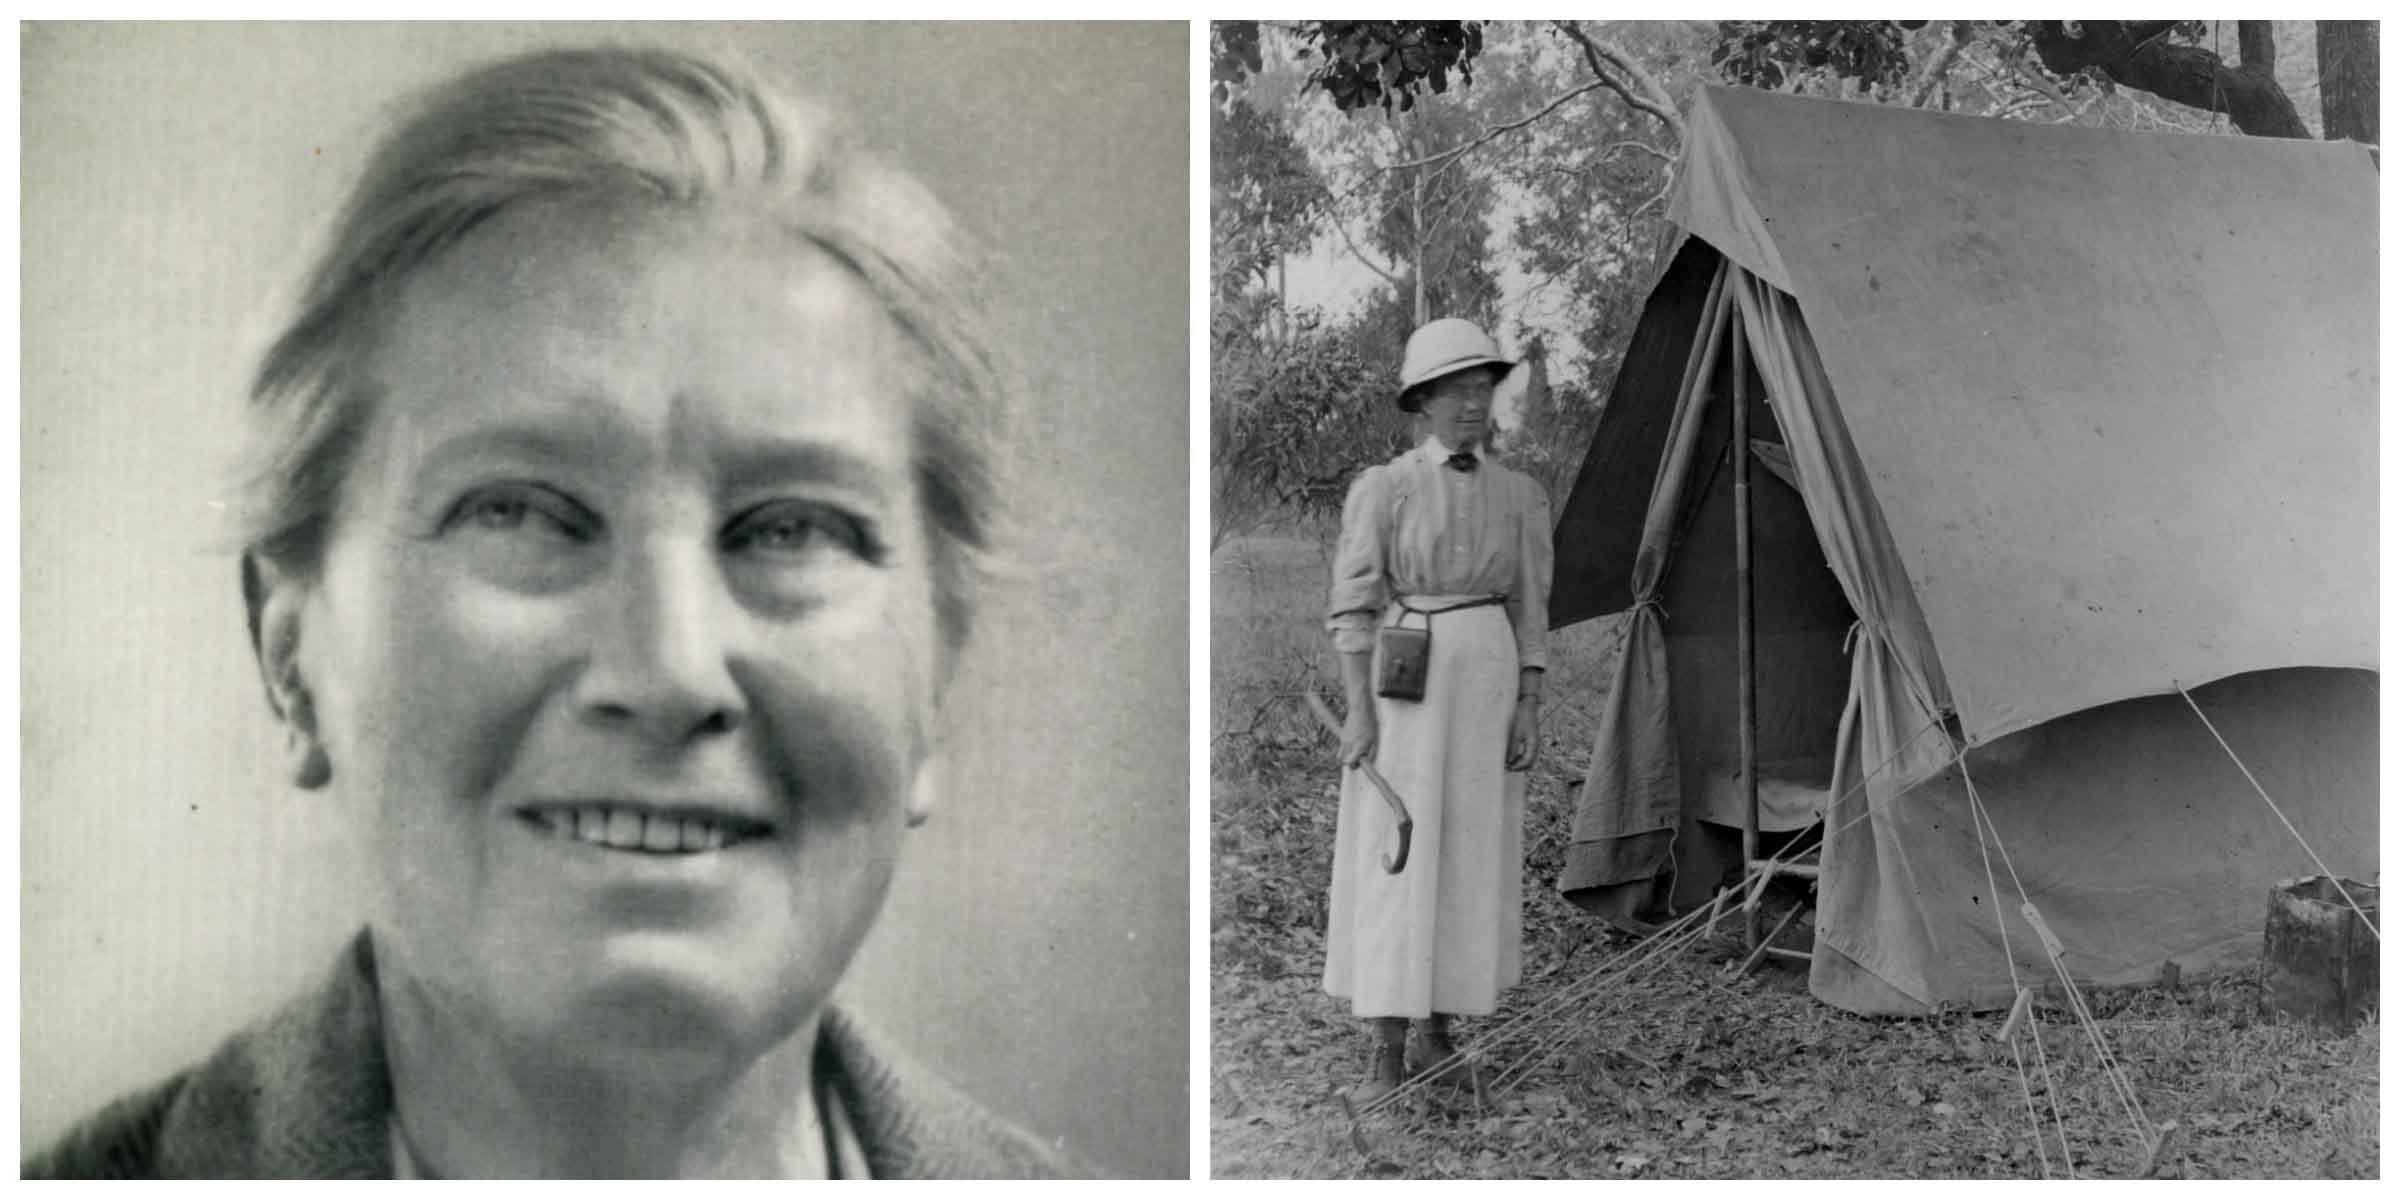 GERTRUDE BENHAM WAS THE FIRST WOMAN TO SUMMIT KILIMANJARO